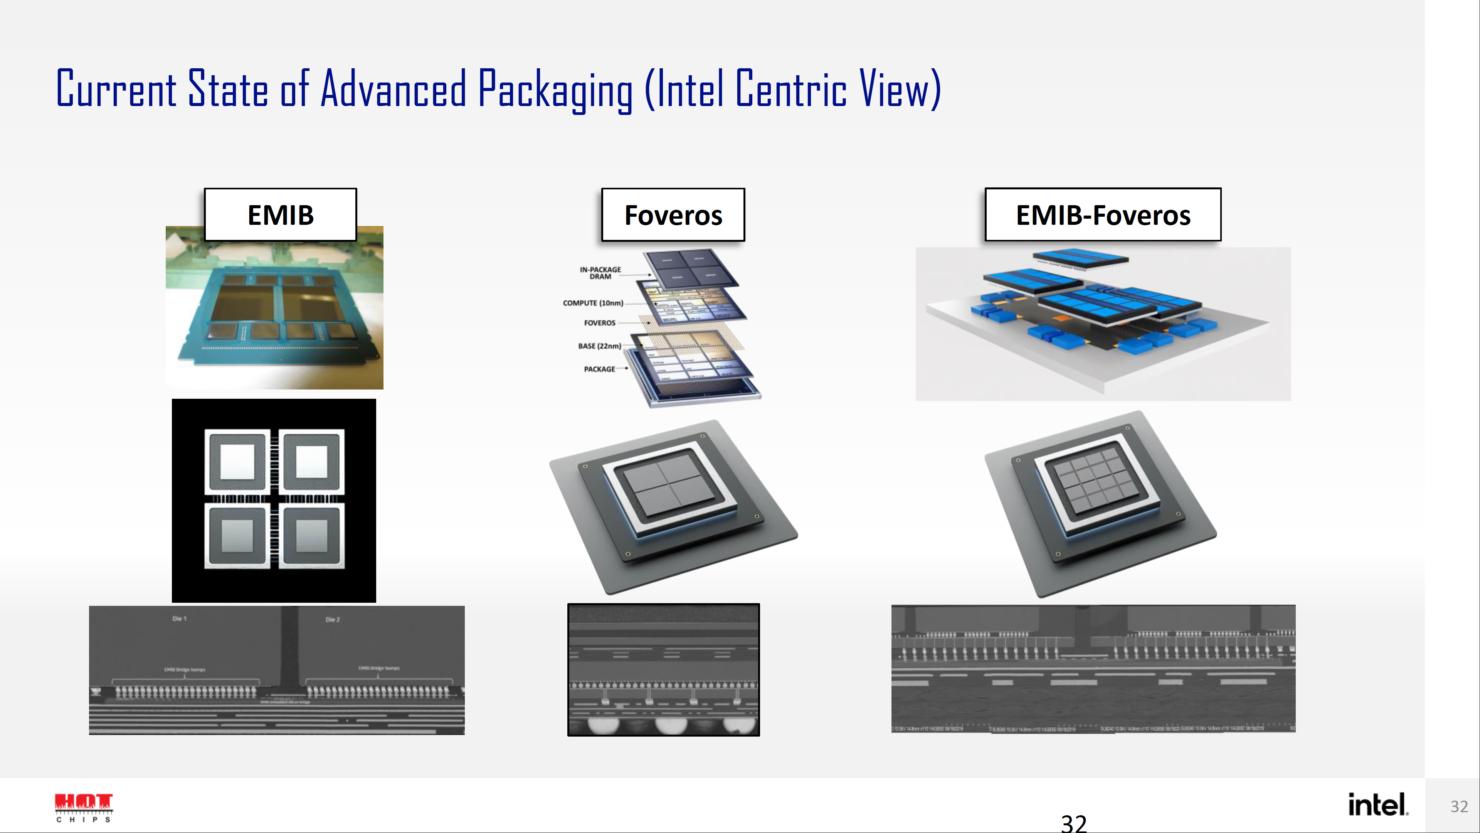 intel-sapphire-rapids-sp-xeon-hbm-cpu-ponte-vecchio-gpu-with-emib-forveros-packaging-technologies-_2